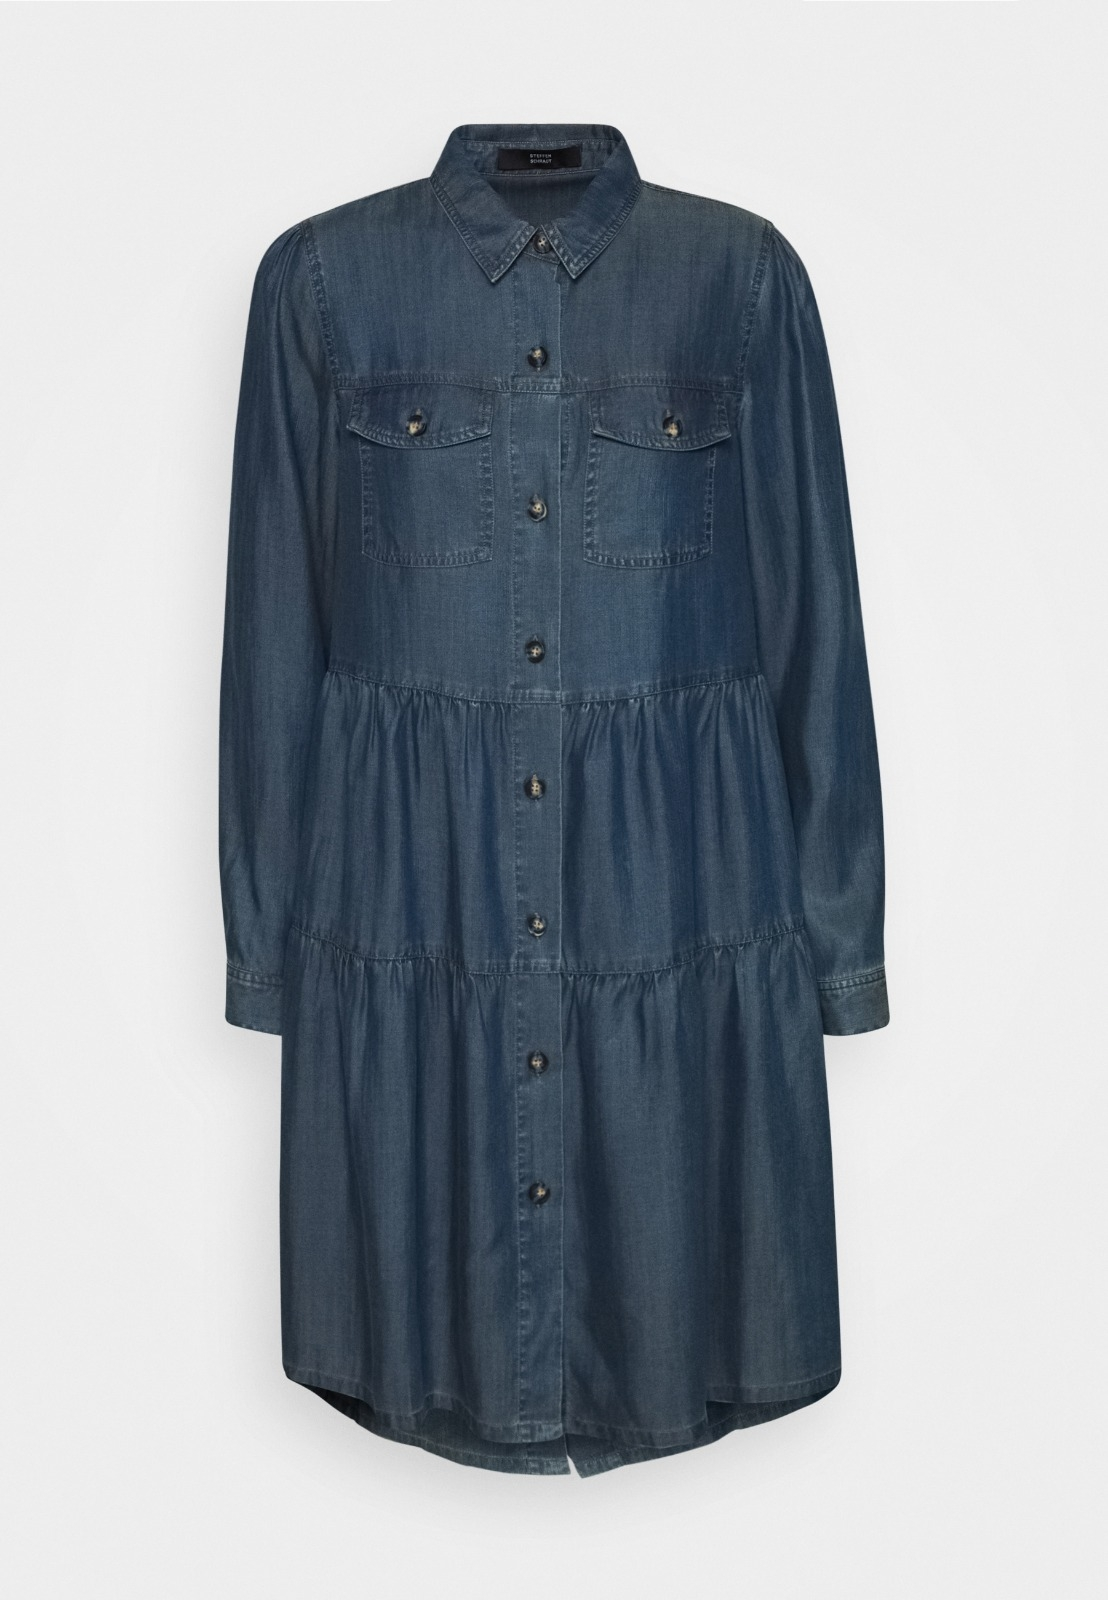 HAMPTONS WEEKEND DRESS